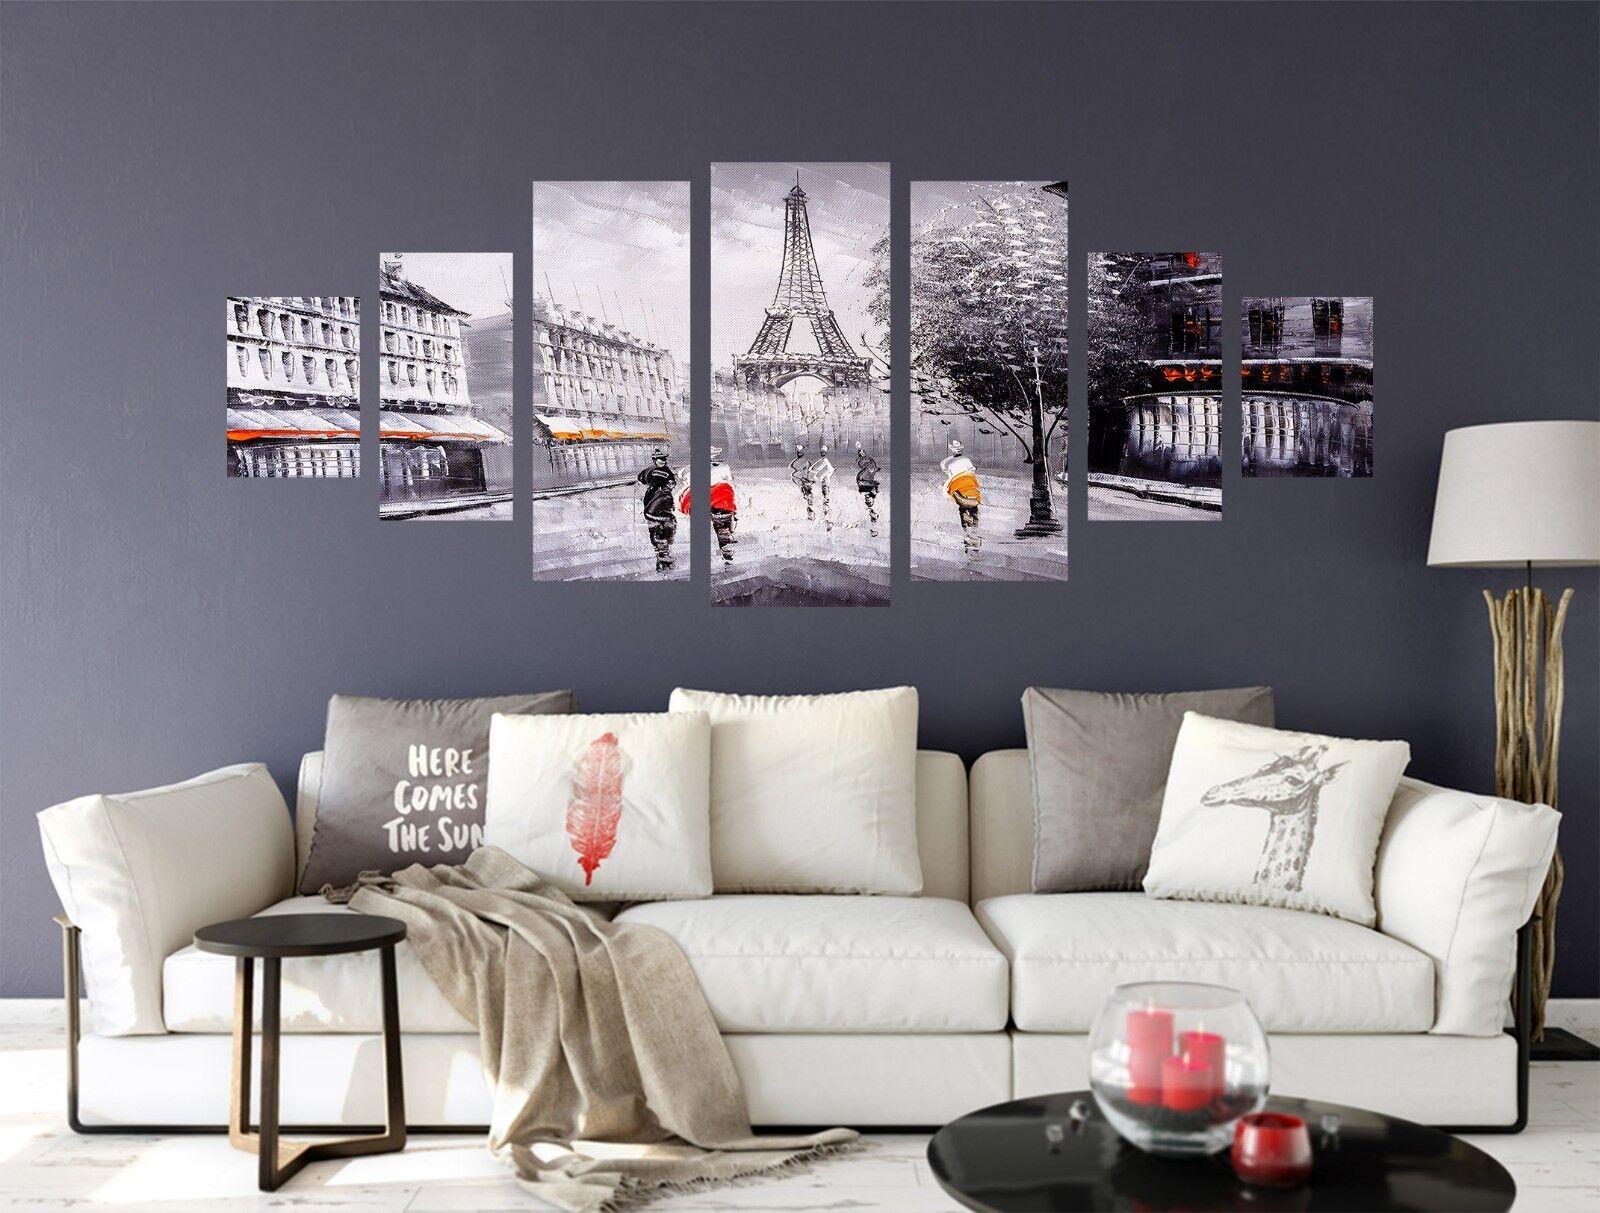 3D Eiffel Tower 675 Unframed Print Wall Paper Decal Wall Deco Indoor AJ Wall